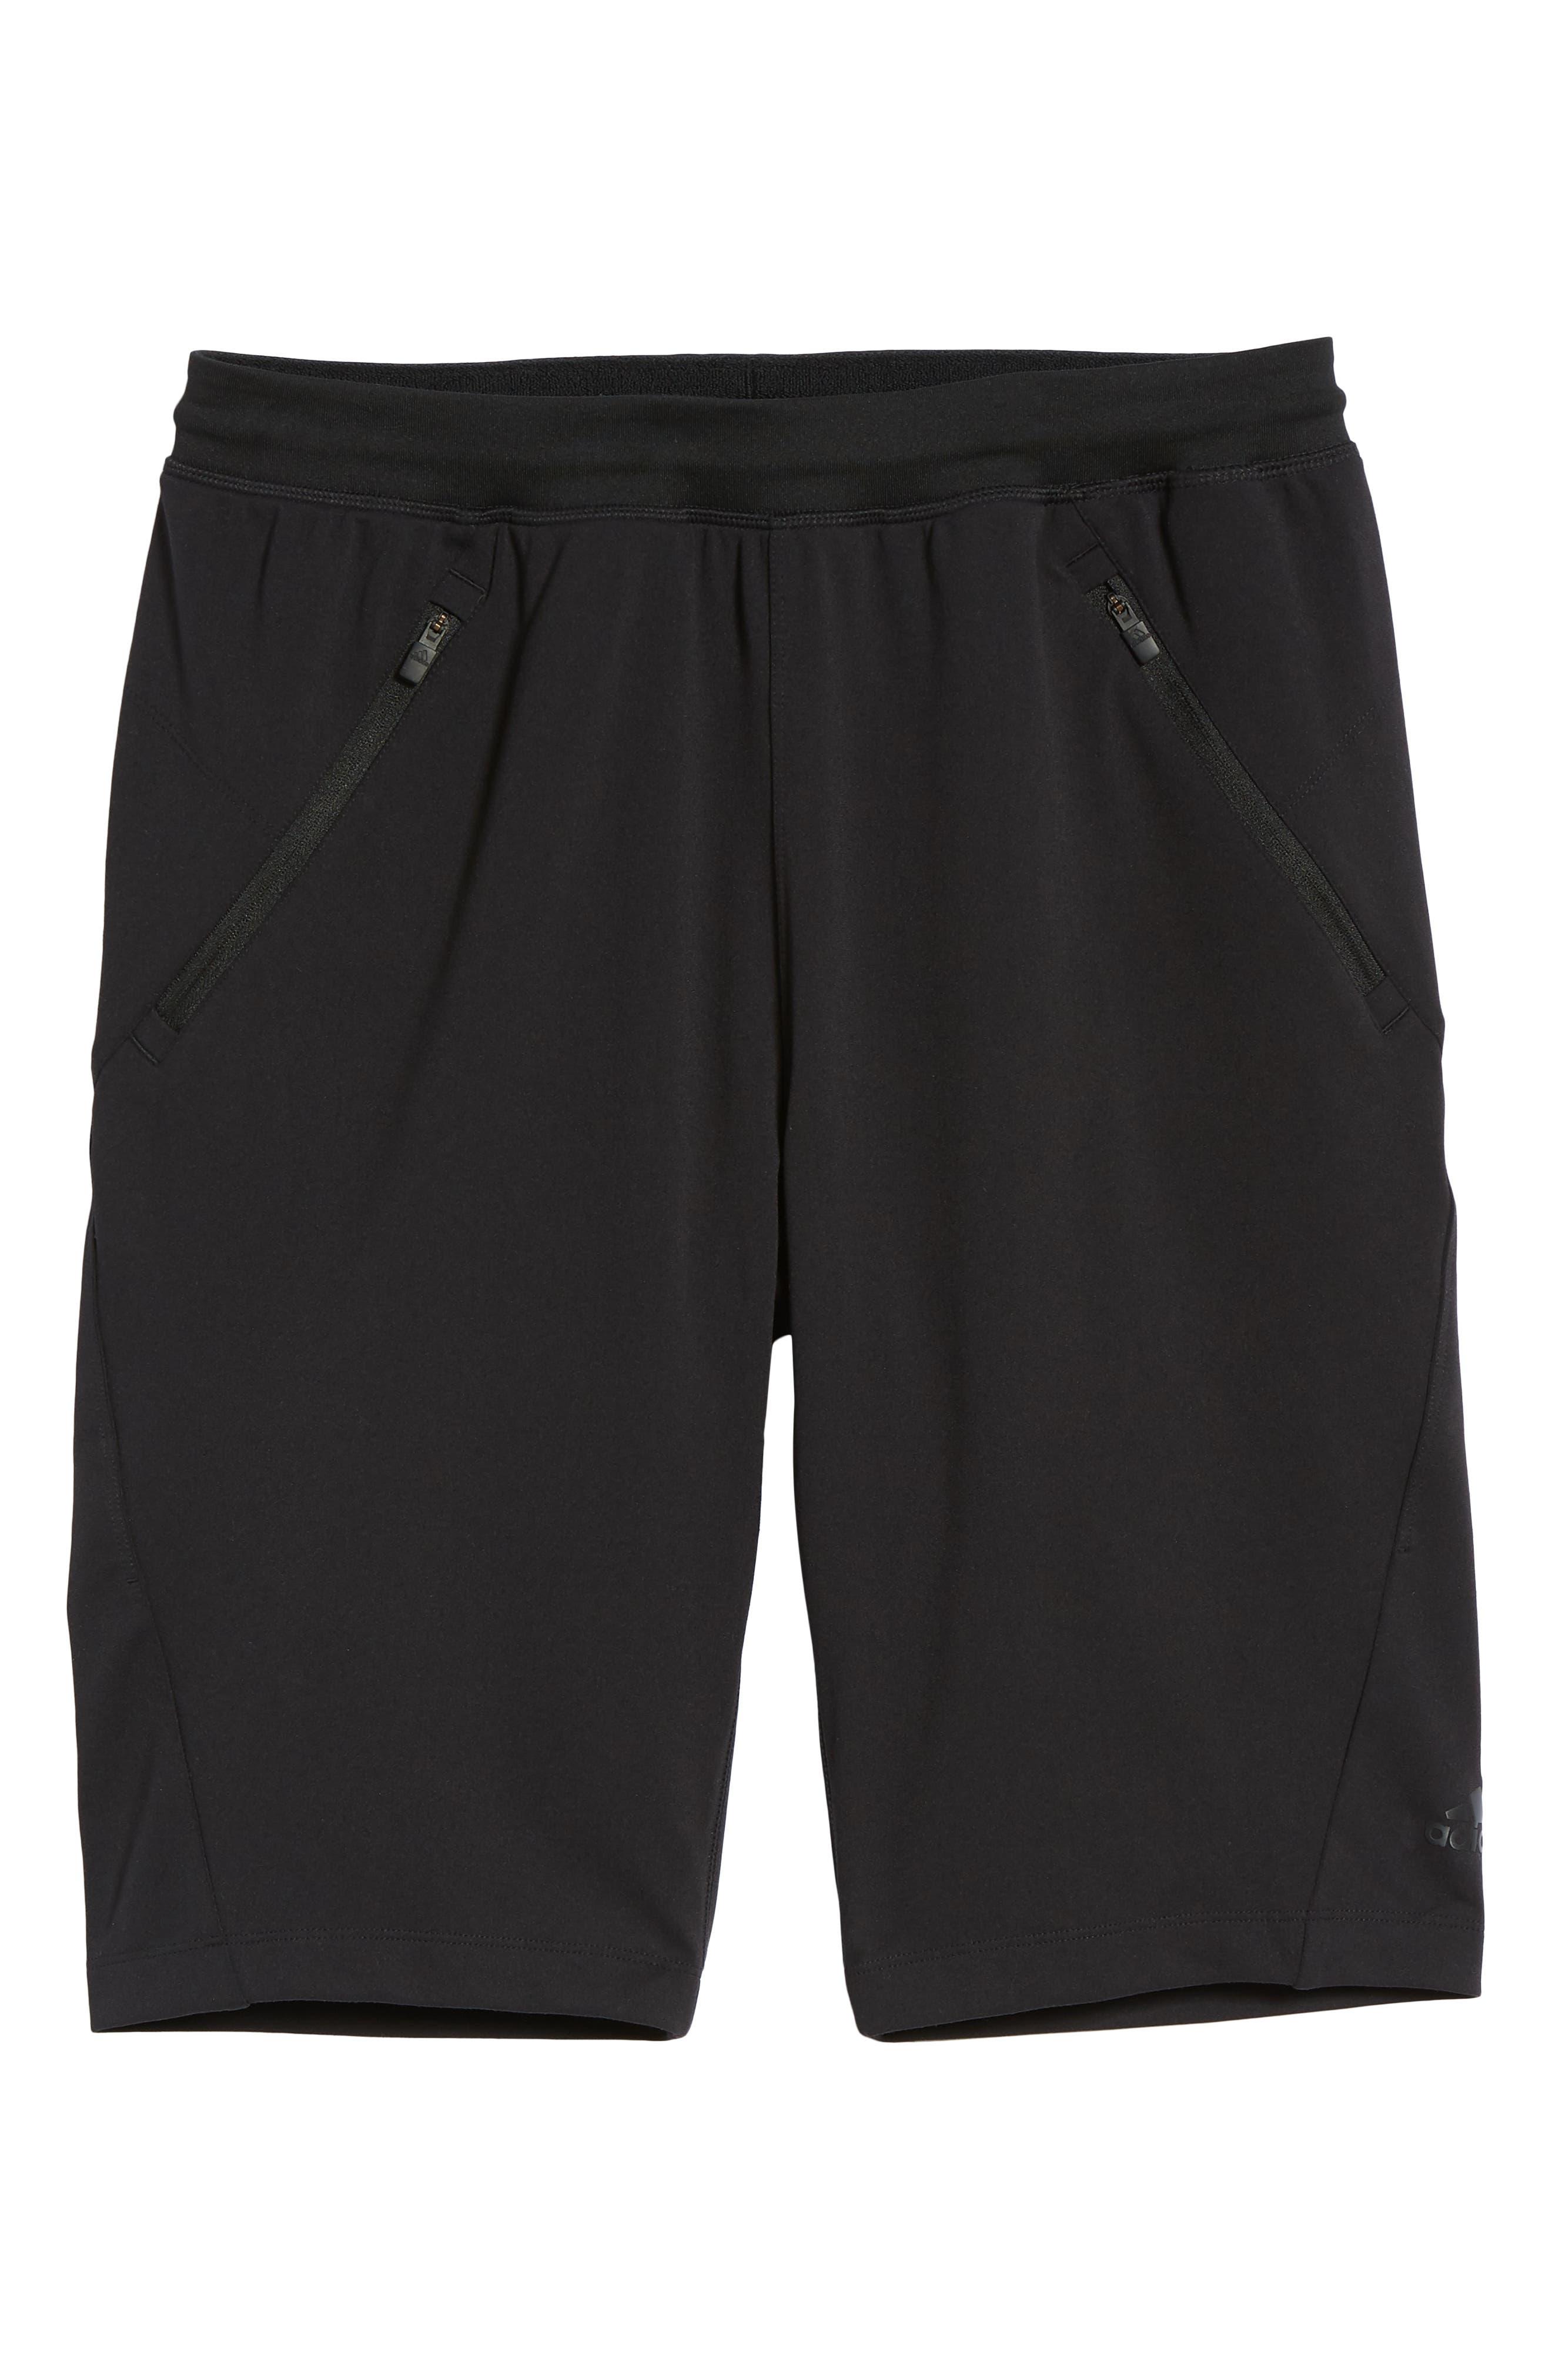 Ultimate Transitional Regular Fit Shorts,                             Alternate thumbnail 6, color,                             Black